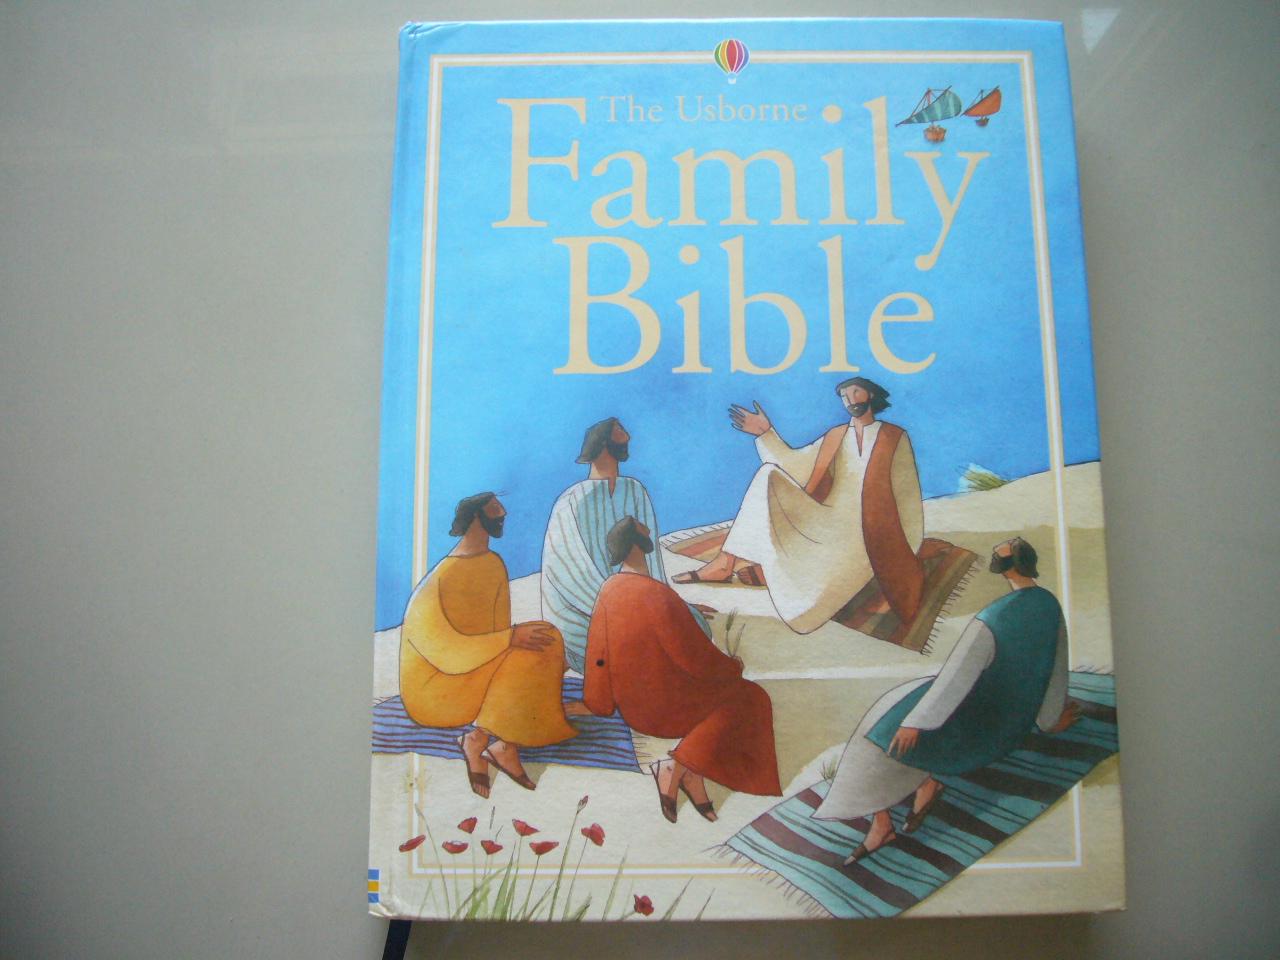 The Usborne Family Bible